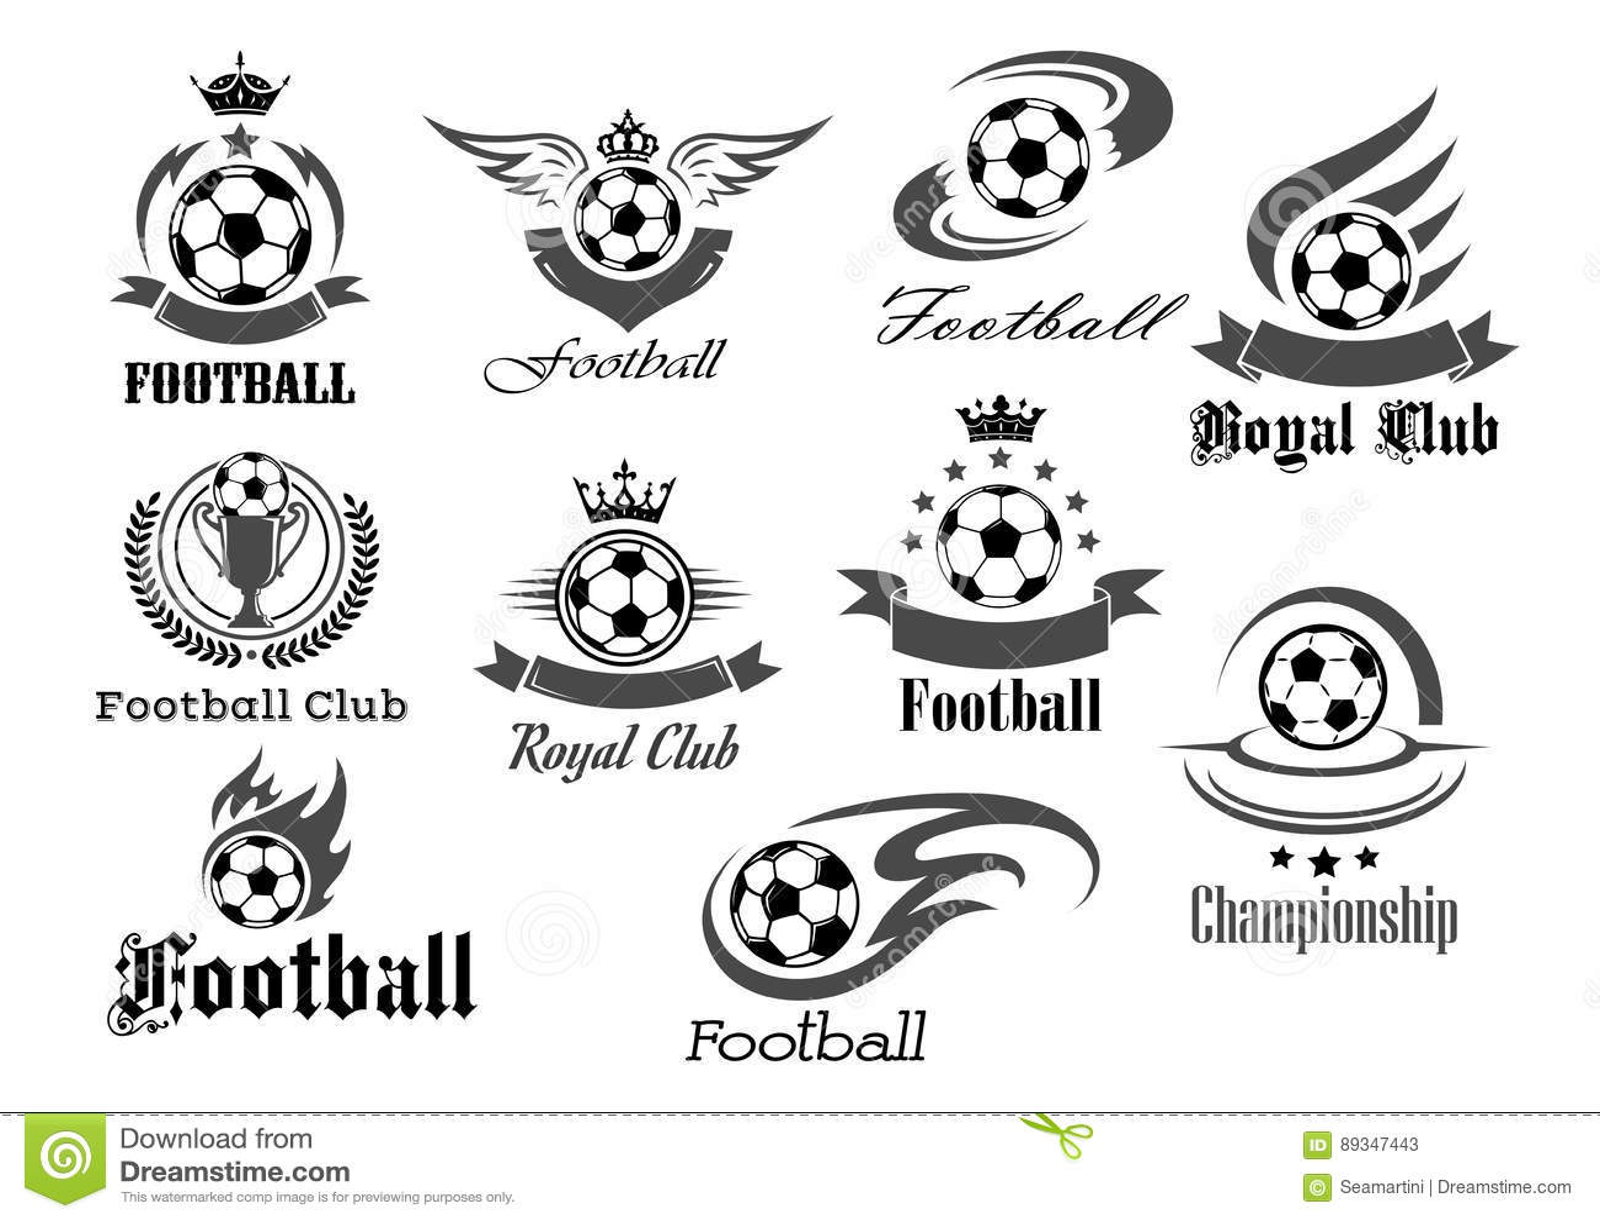 Football Ball Vector Icons For Royal Soccer Stock Vector